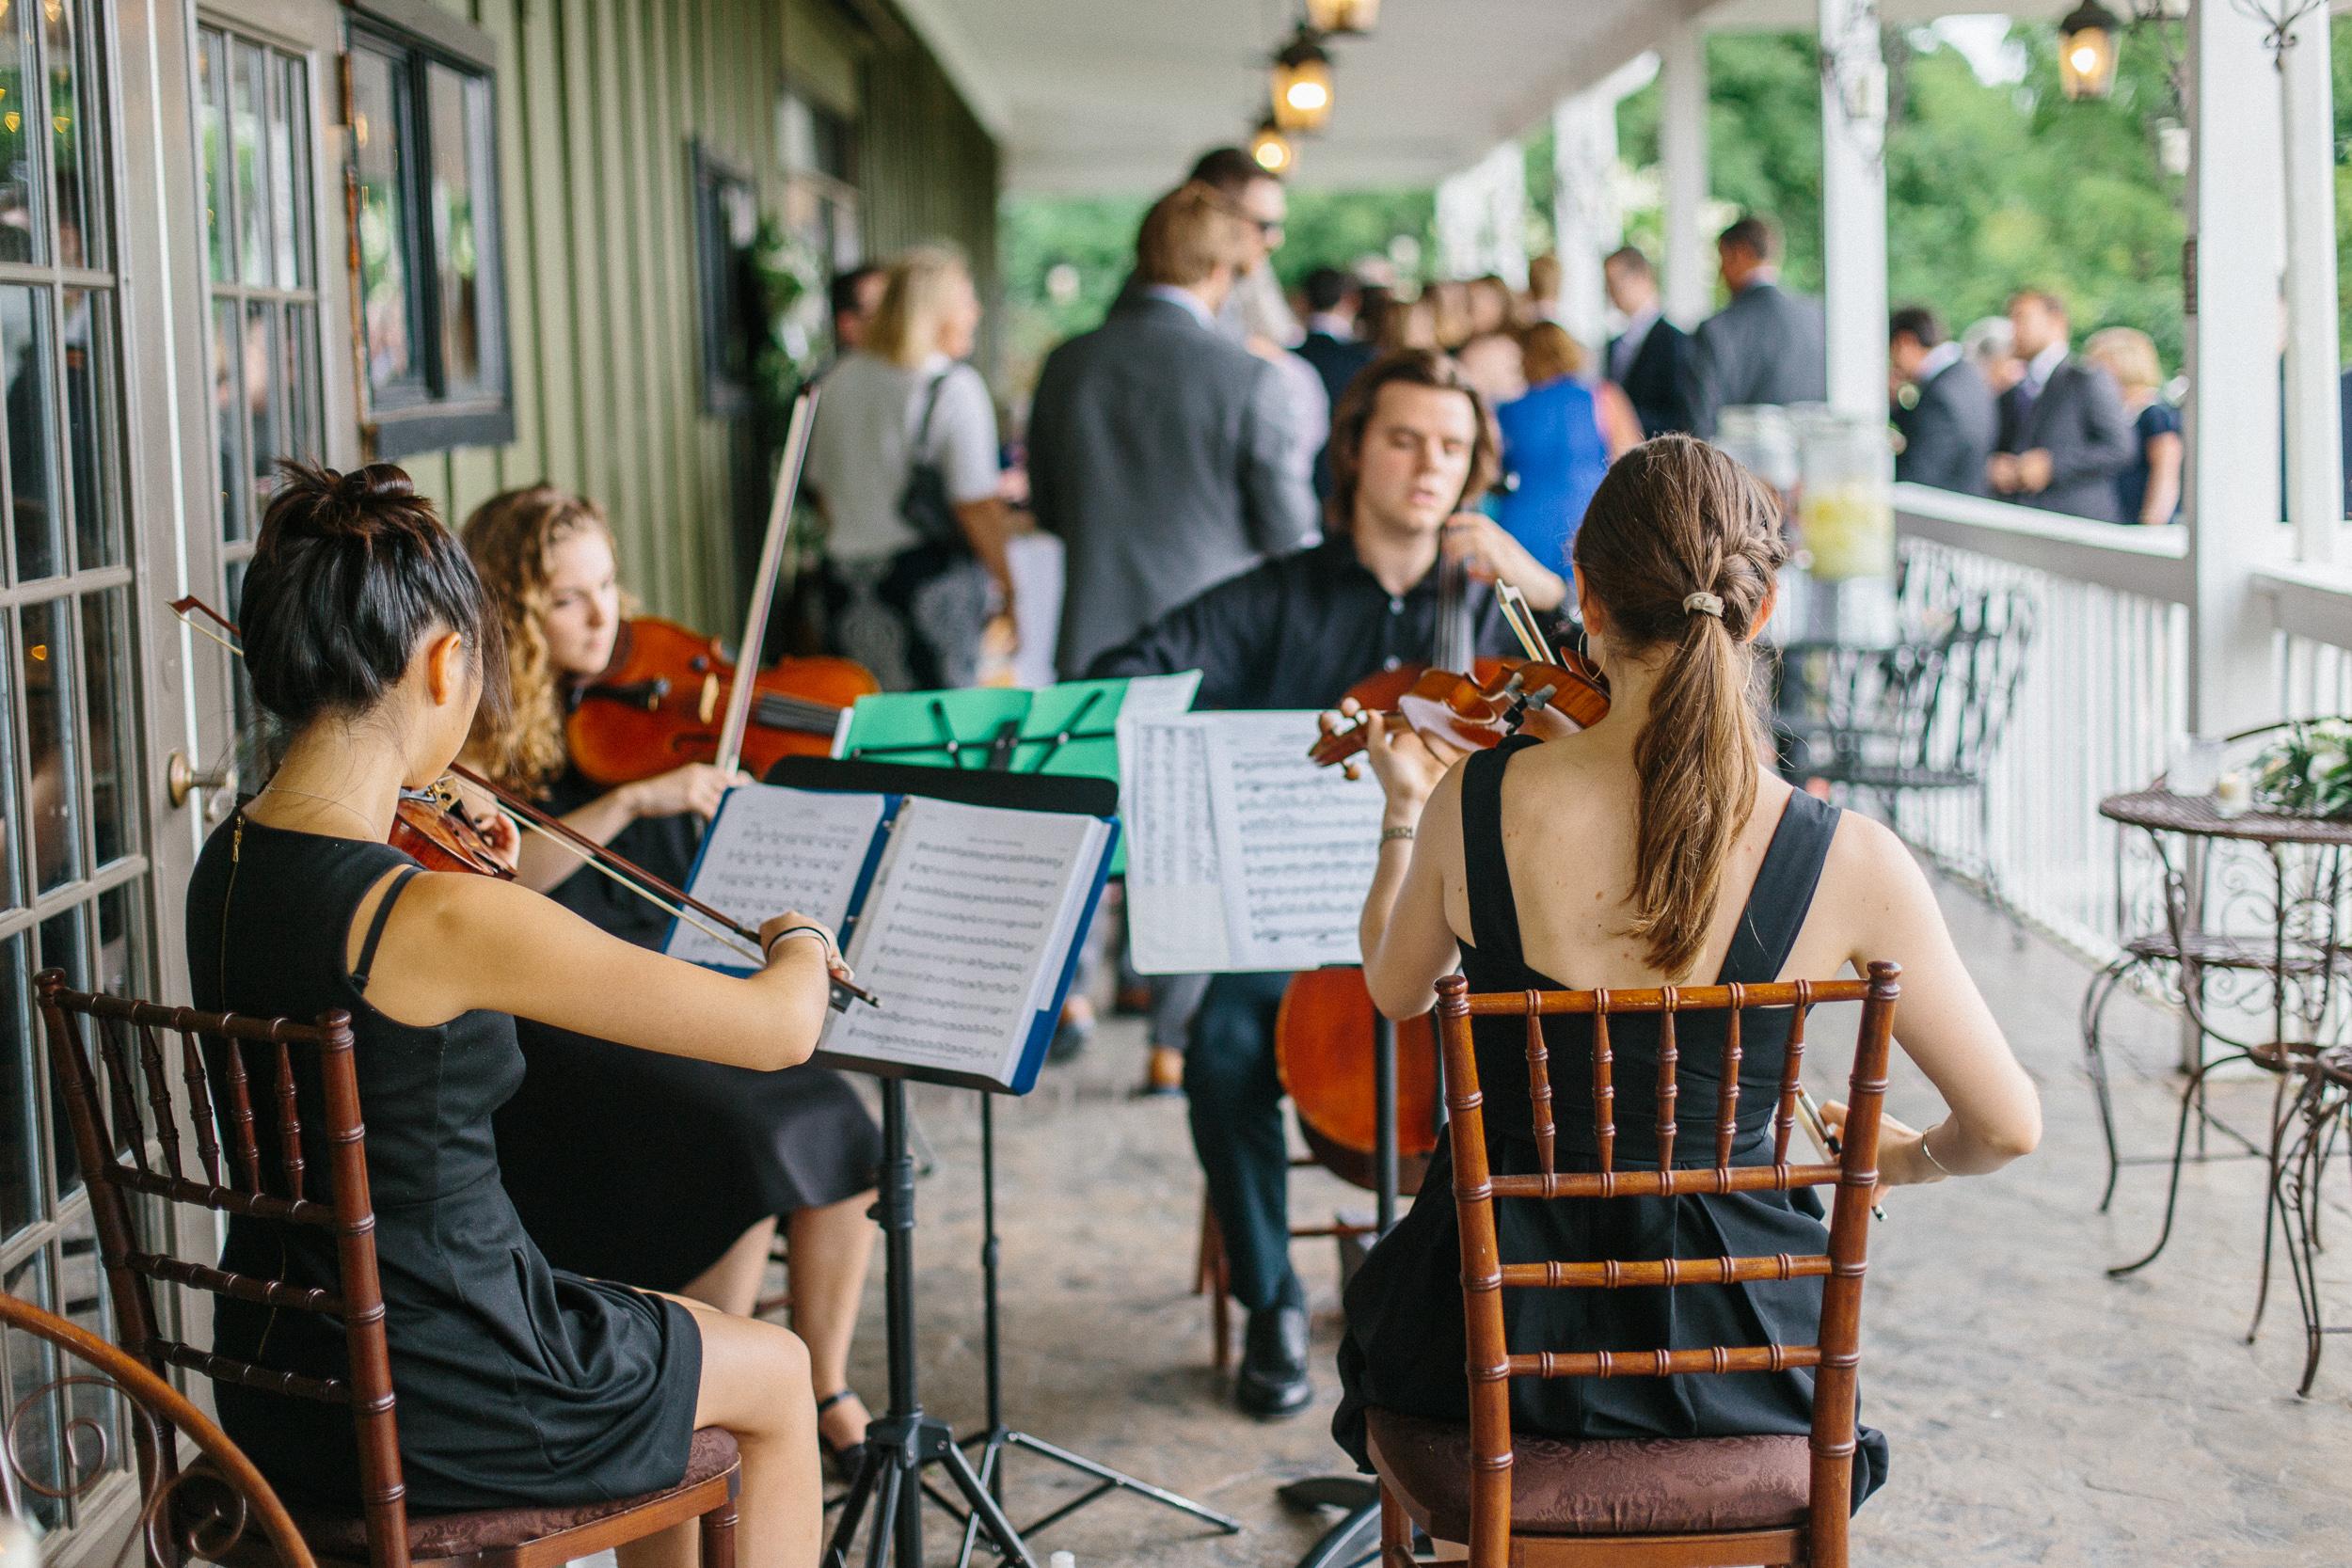 tres-doux-quartet-wedding-reception-musician